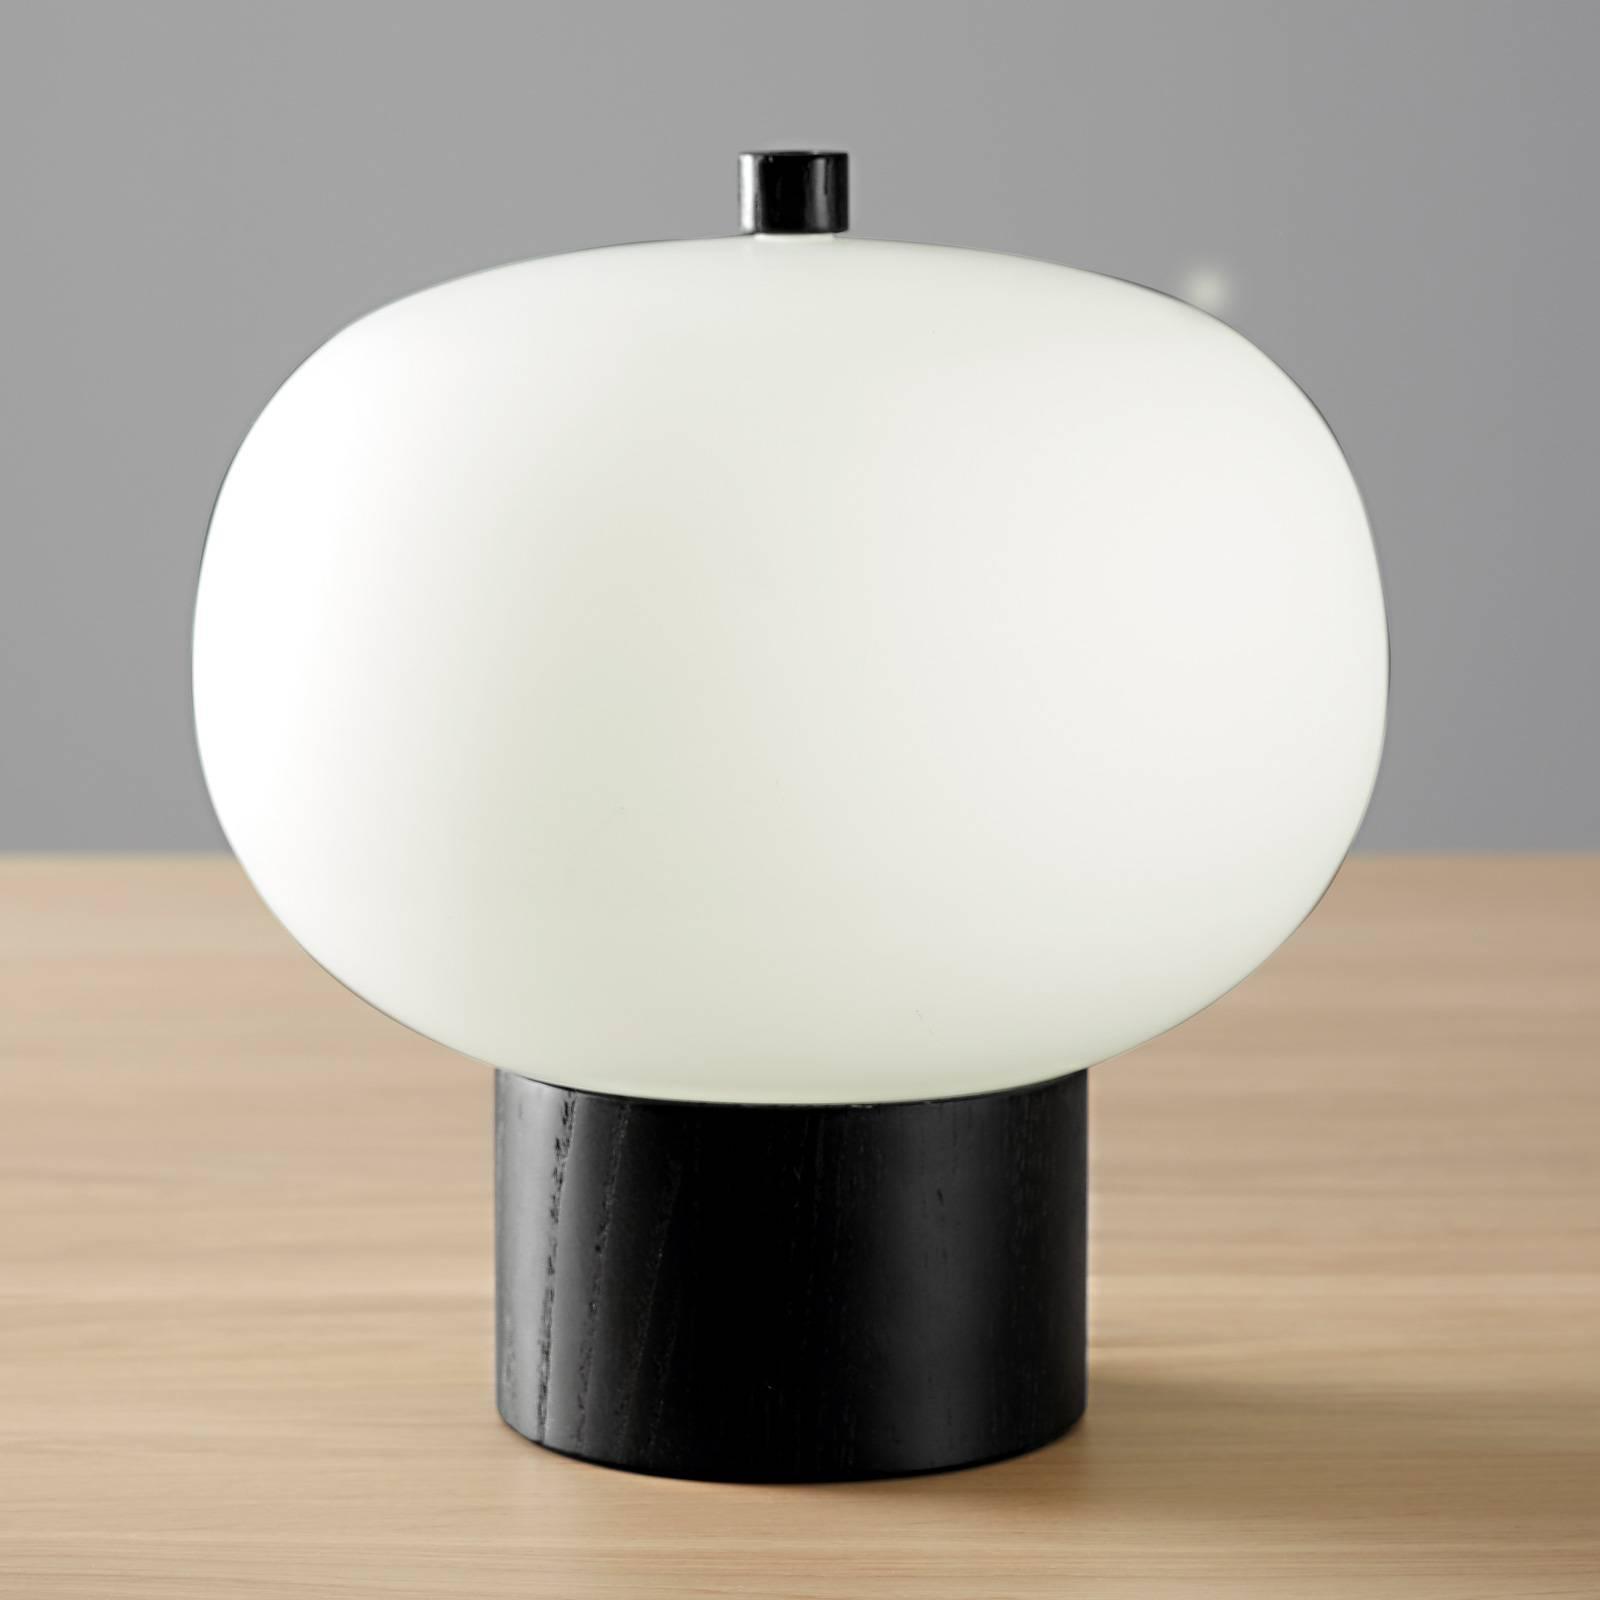 Grok iLargi lampe à poser LED Ø 24cm, frêne foncé